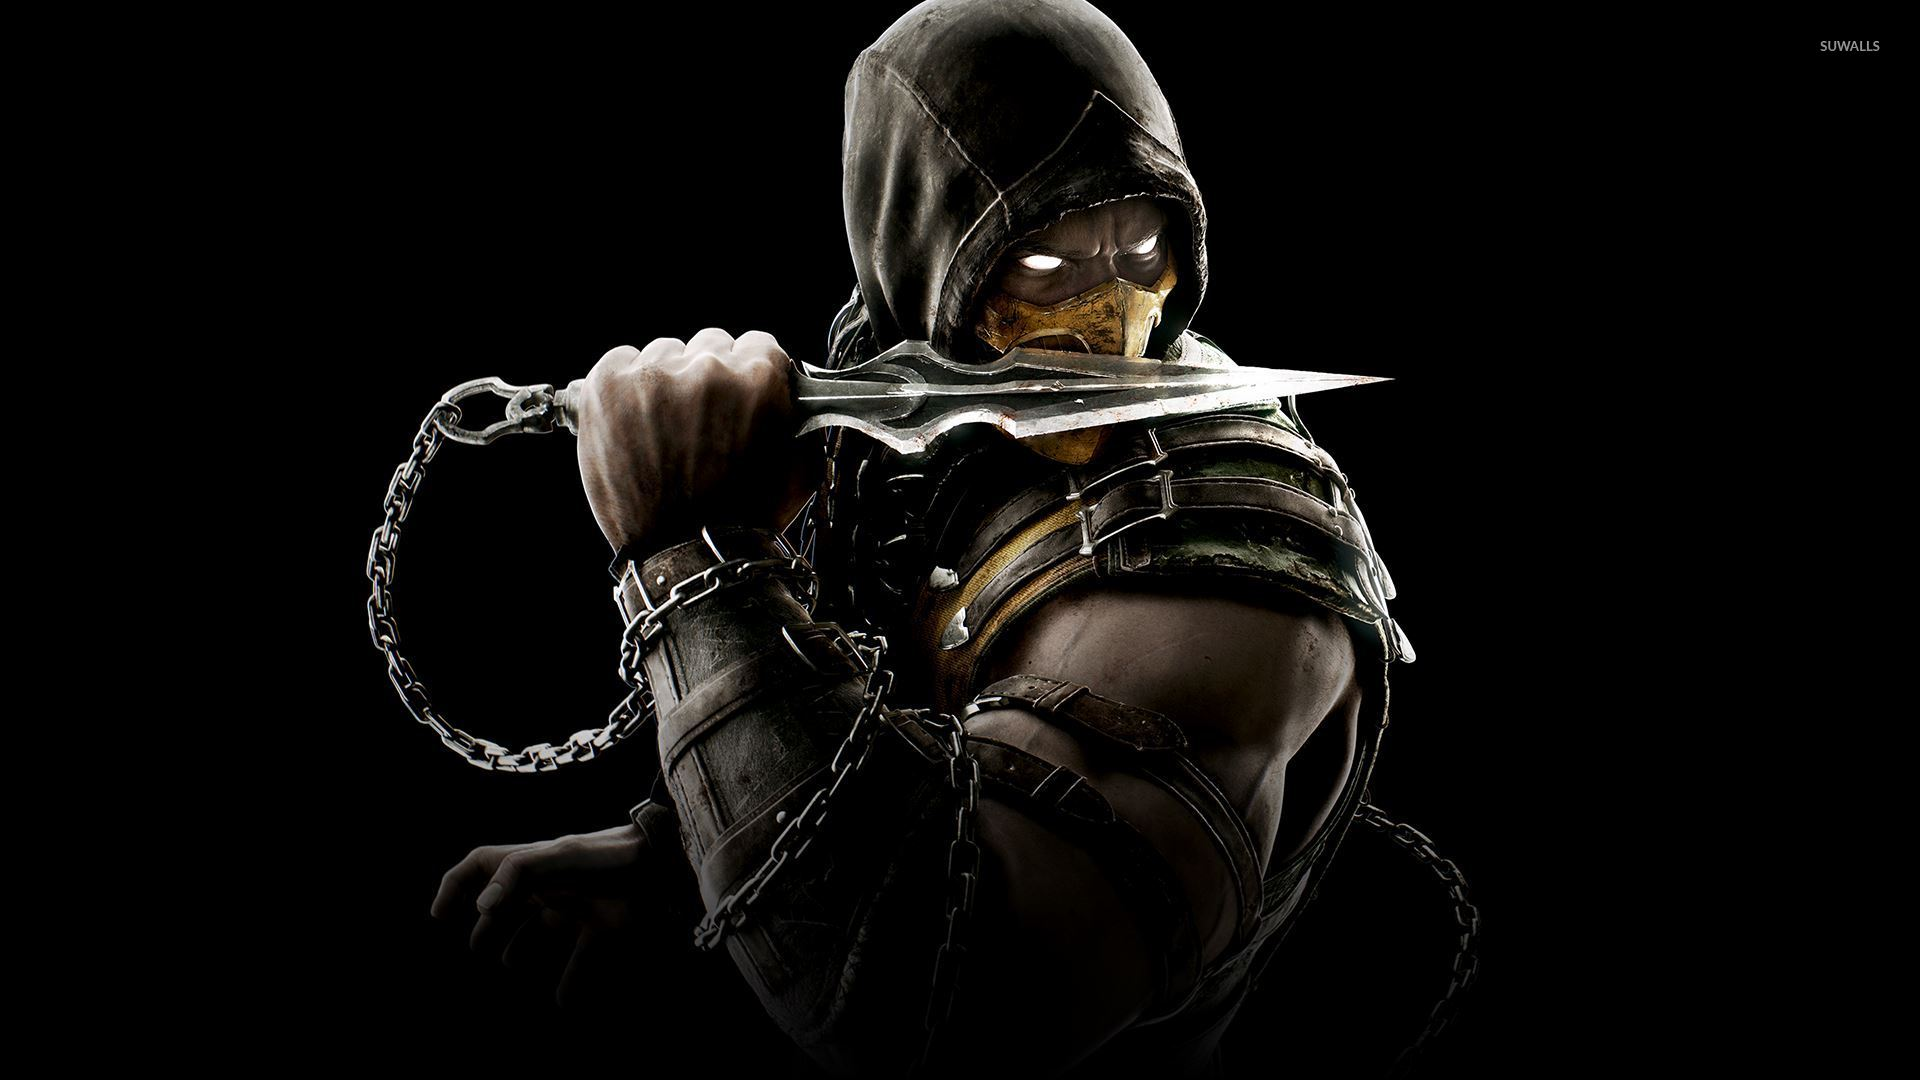 Scorpion Mortal Kombat X 3 Wallpaper Game Wallpapers 42639